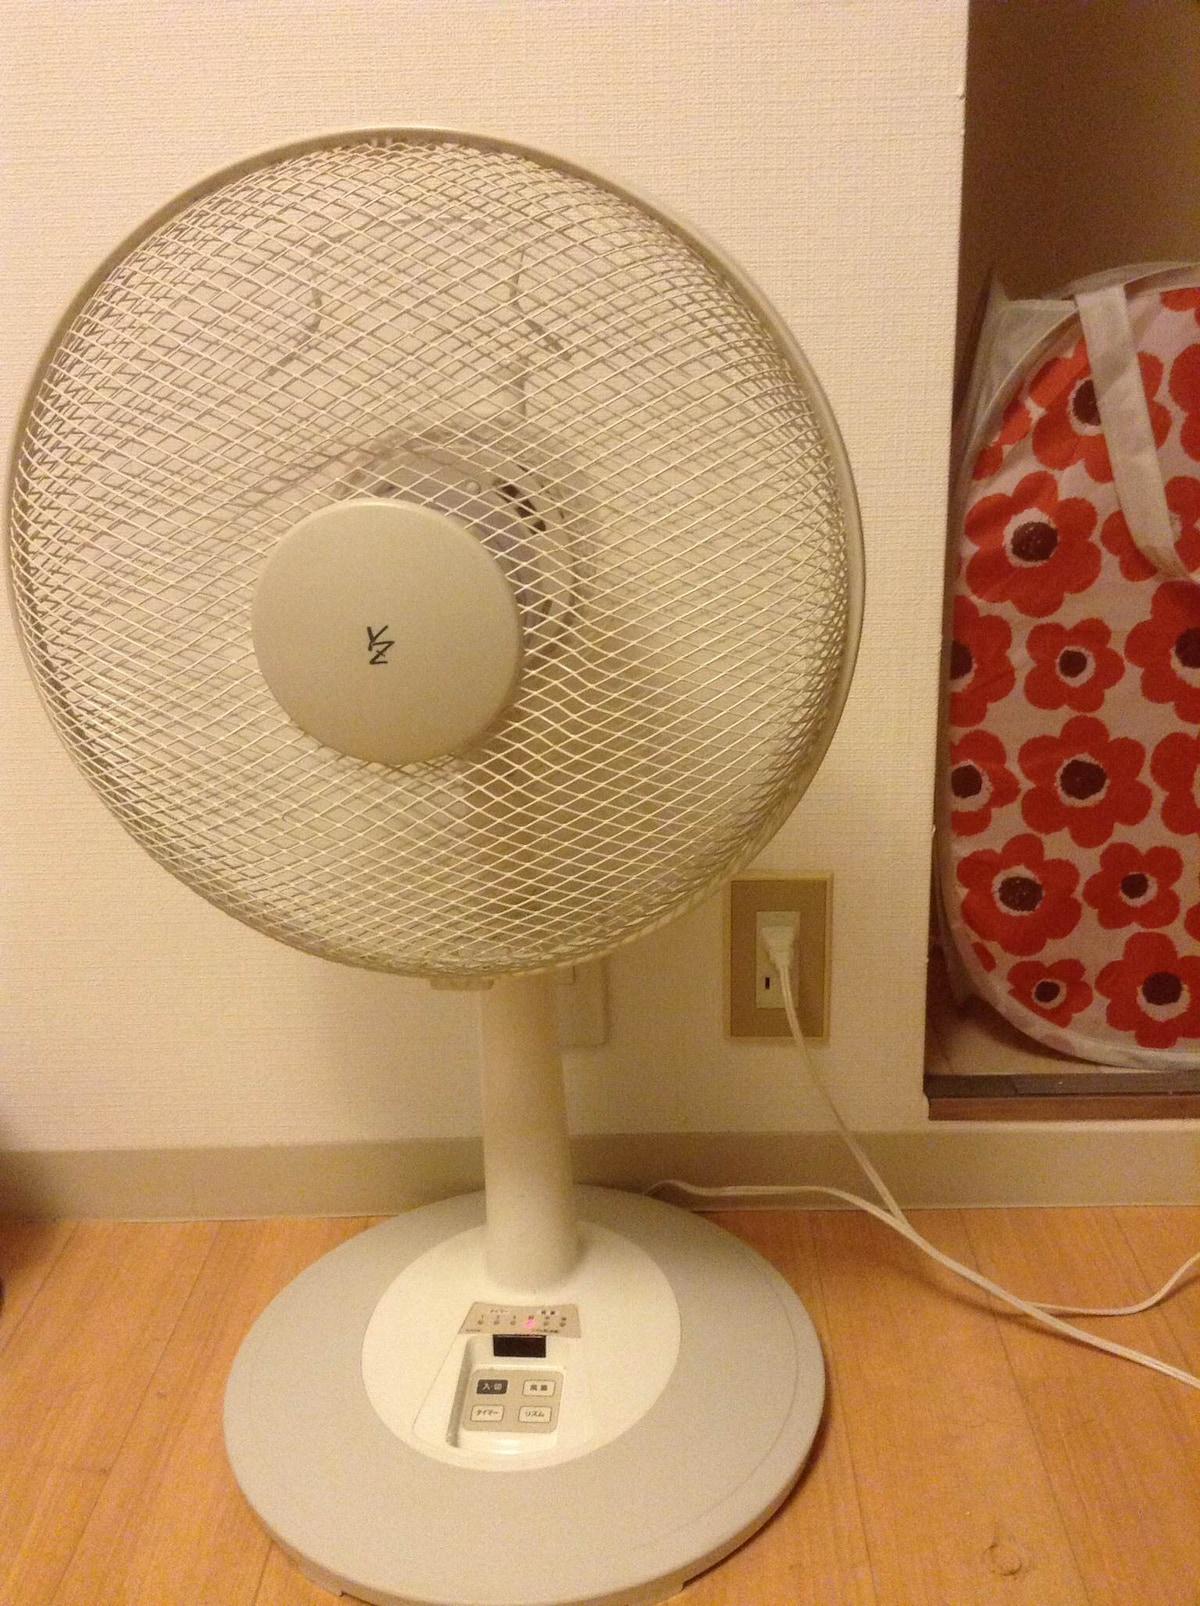 Electric fan for summer!